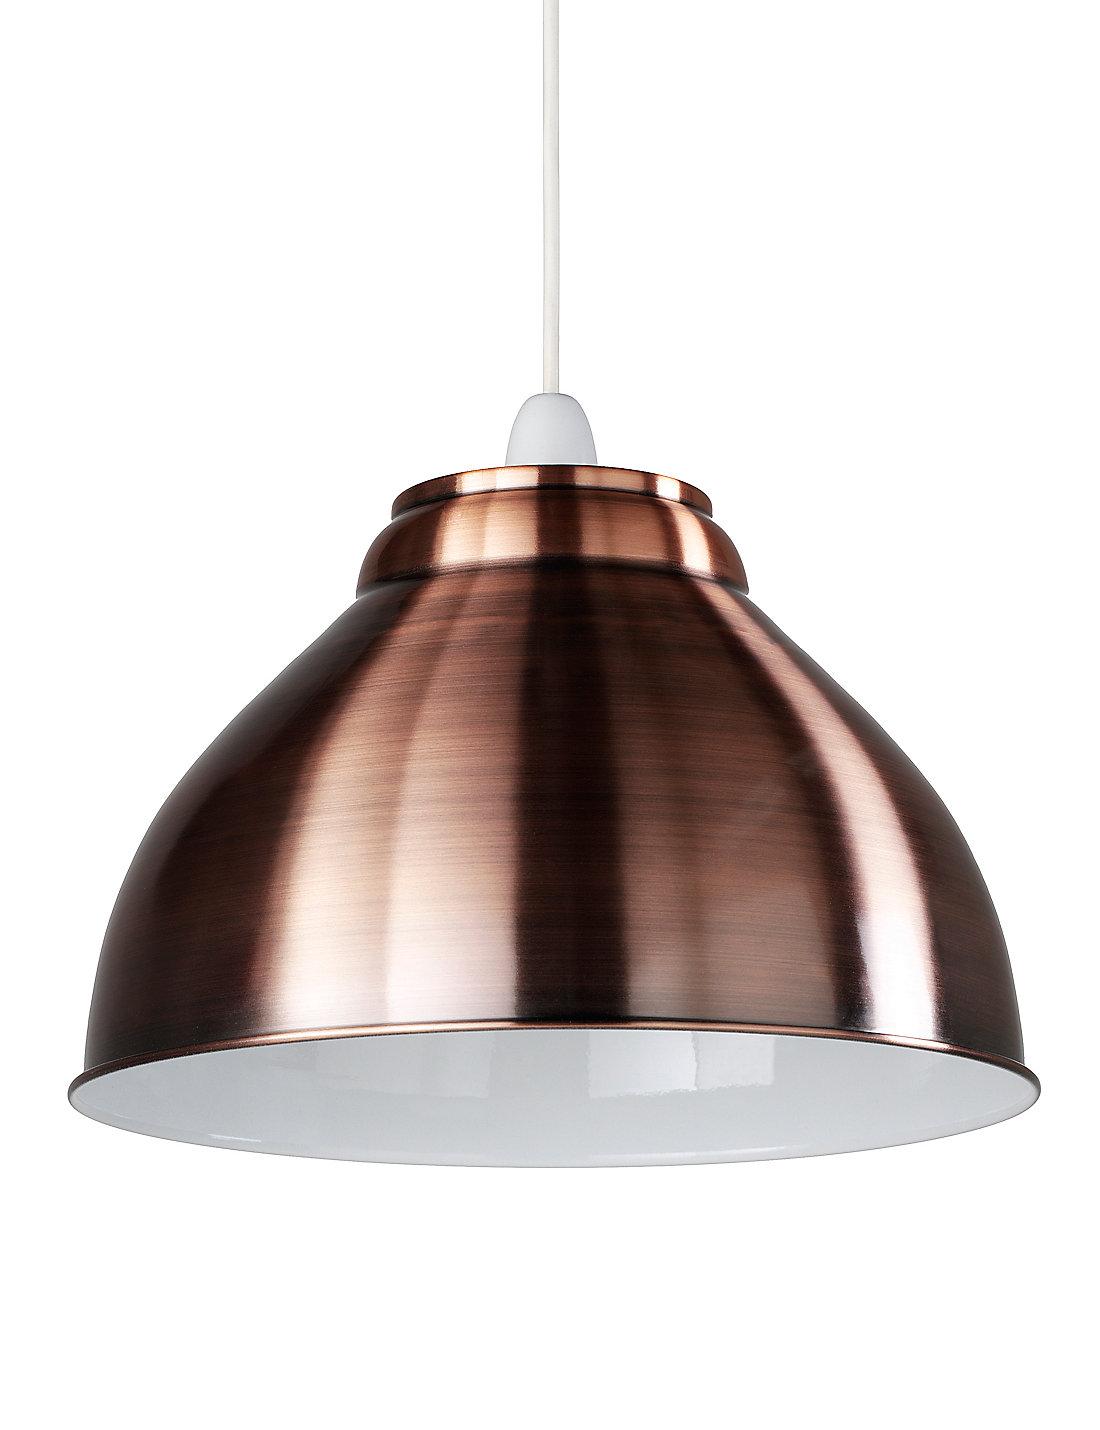 Next Ceiling Light Shades: New Retro Ceiling Lamp Shade,Lighting